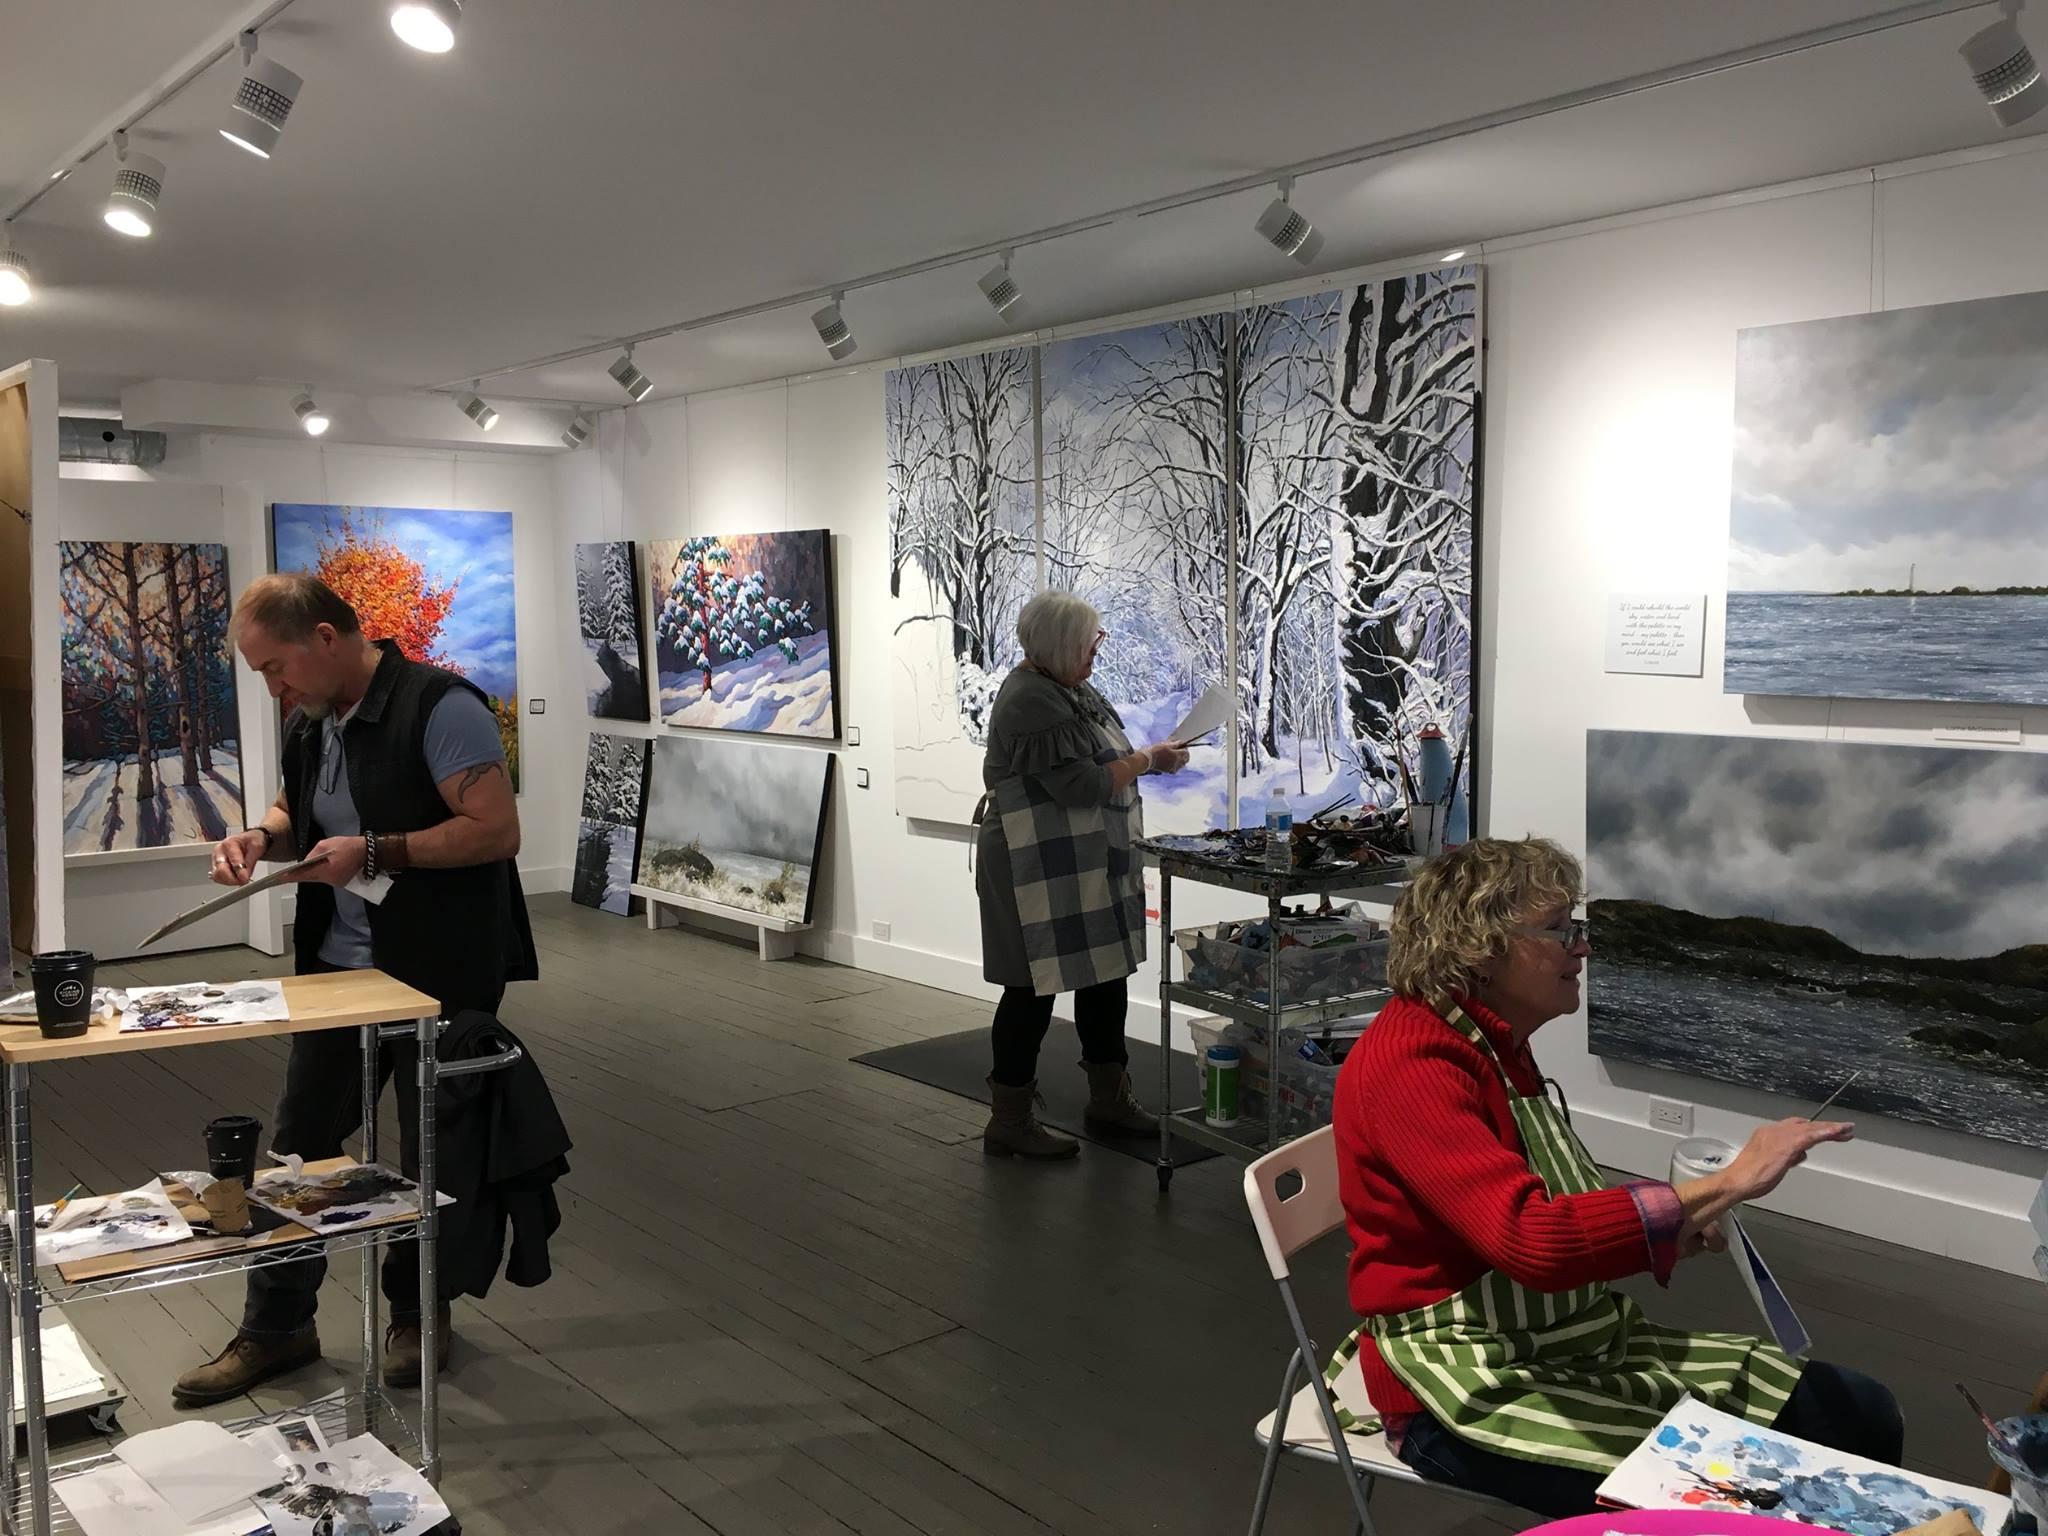 Loft Gallery